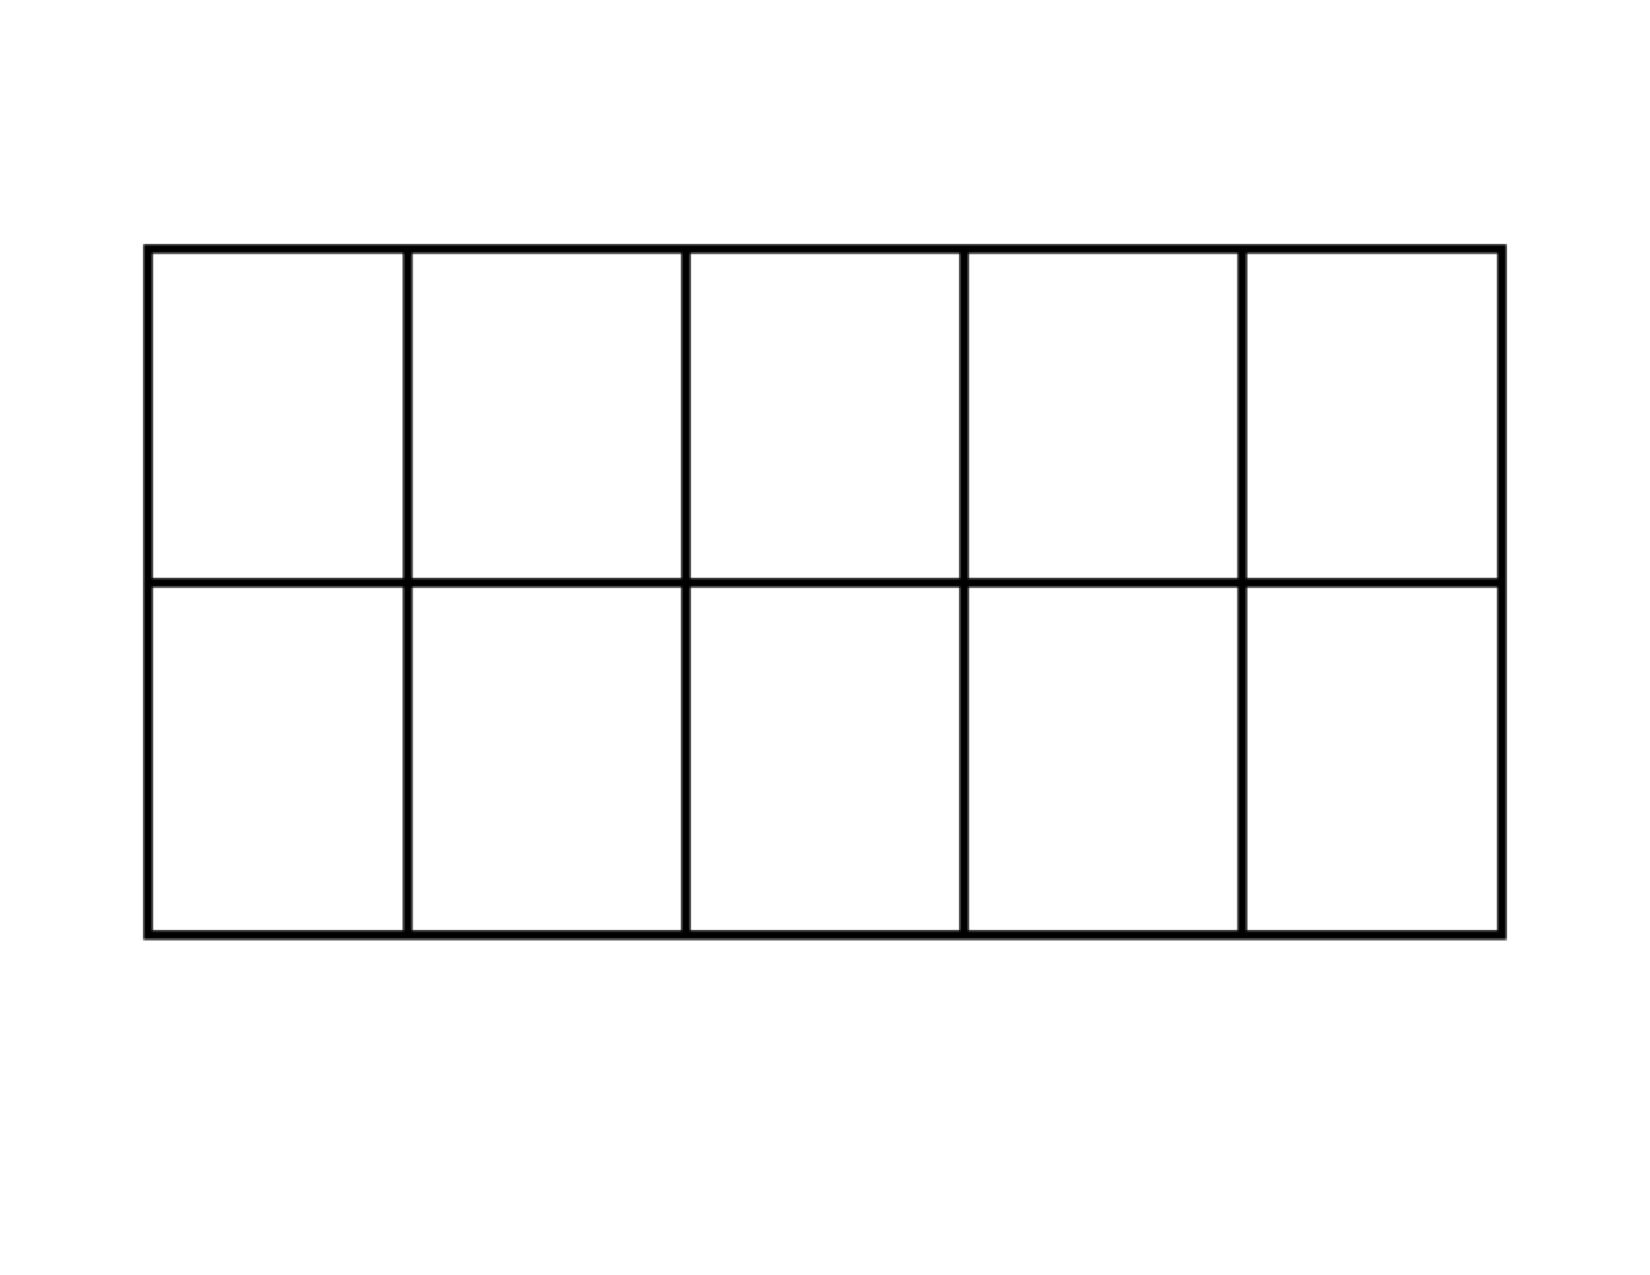 The 10 Frame Bakery Kindergarten Math Activity Aligned